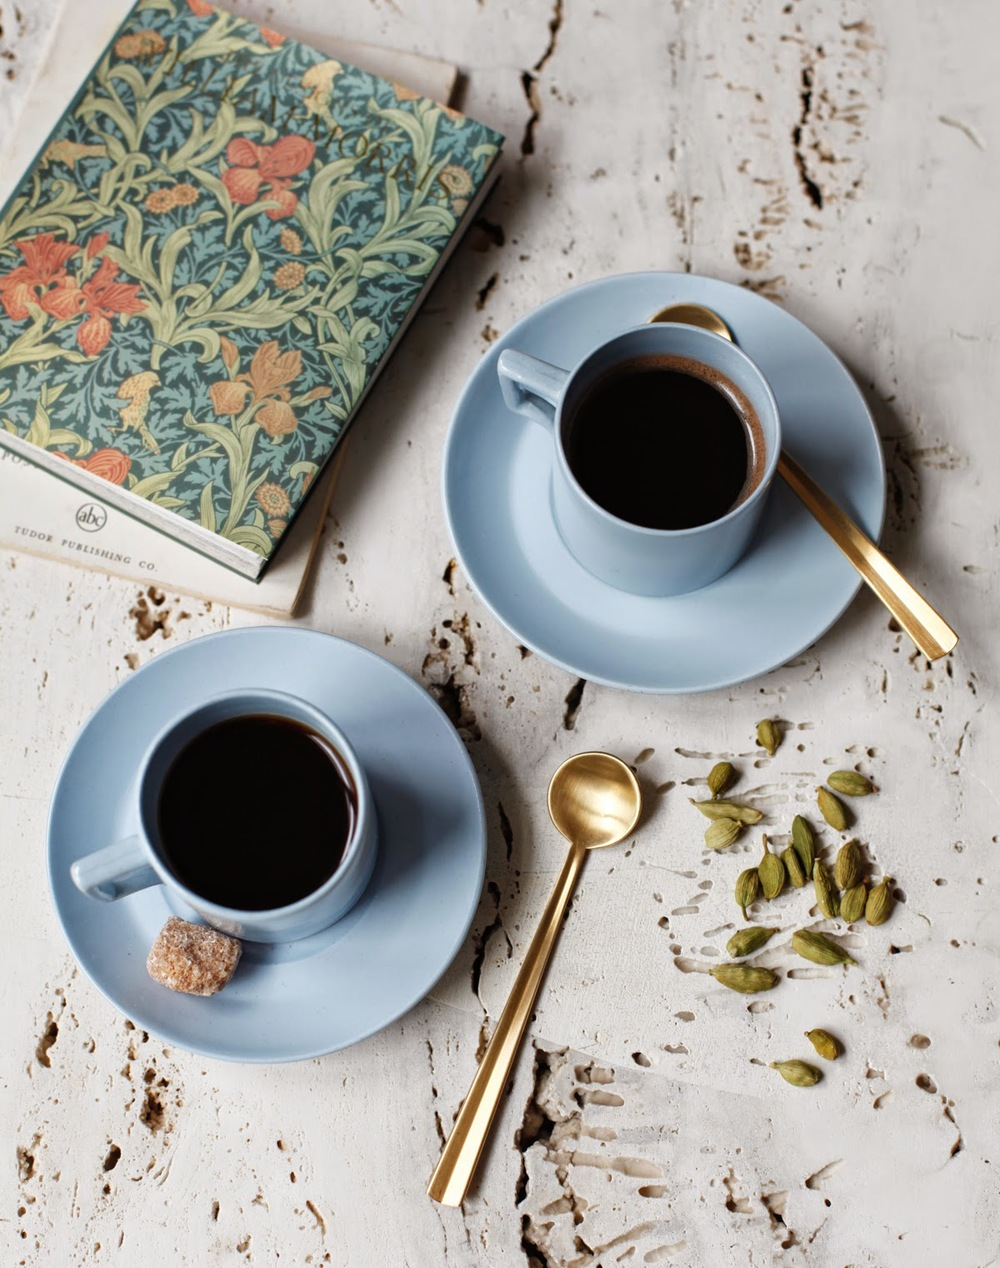 Kinfolk_Web_Diana-Yen_Cardamom-Coffee-1.jpg